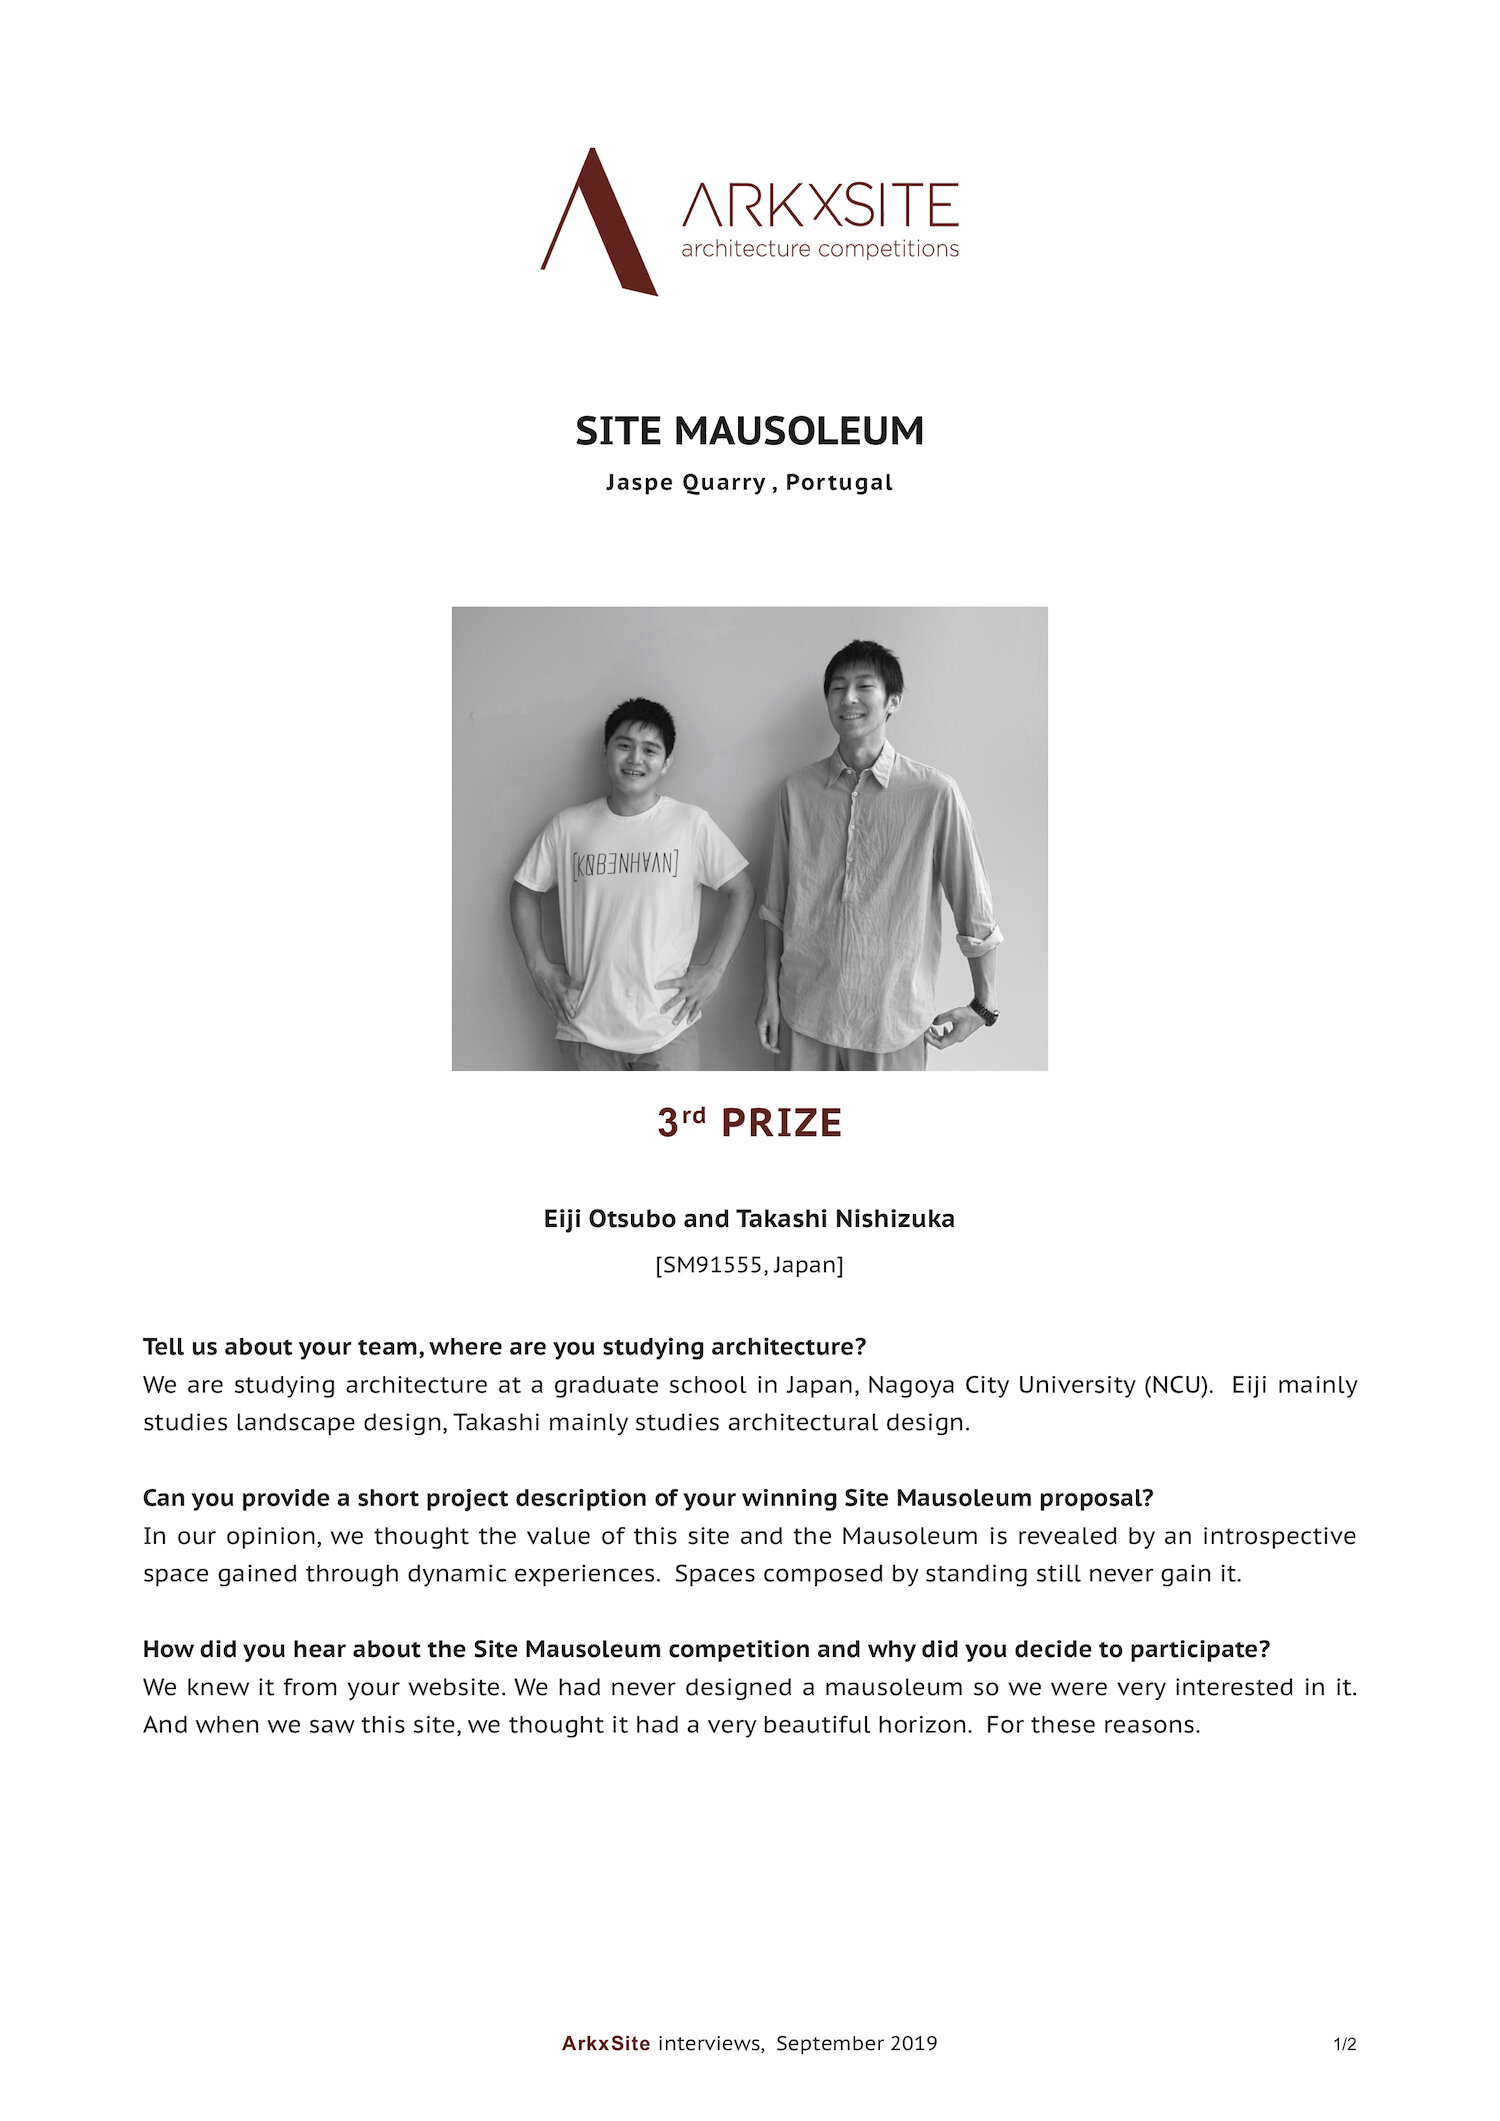 SiteMausoleum_3rdPrize_InterviewA.jpg